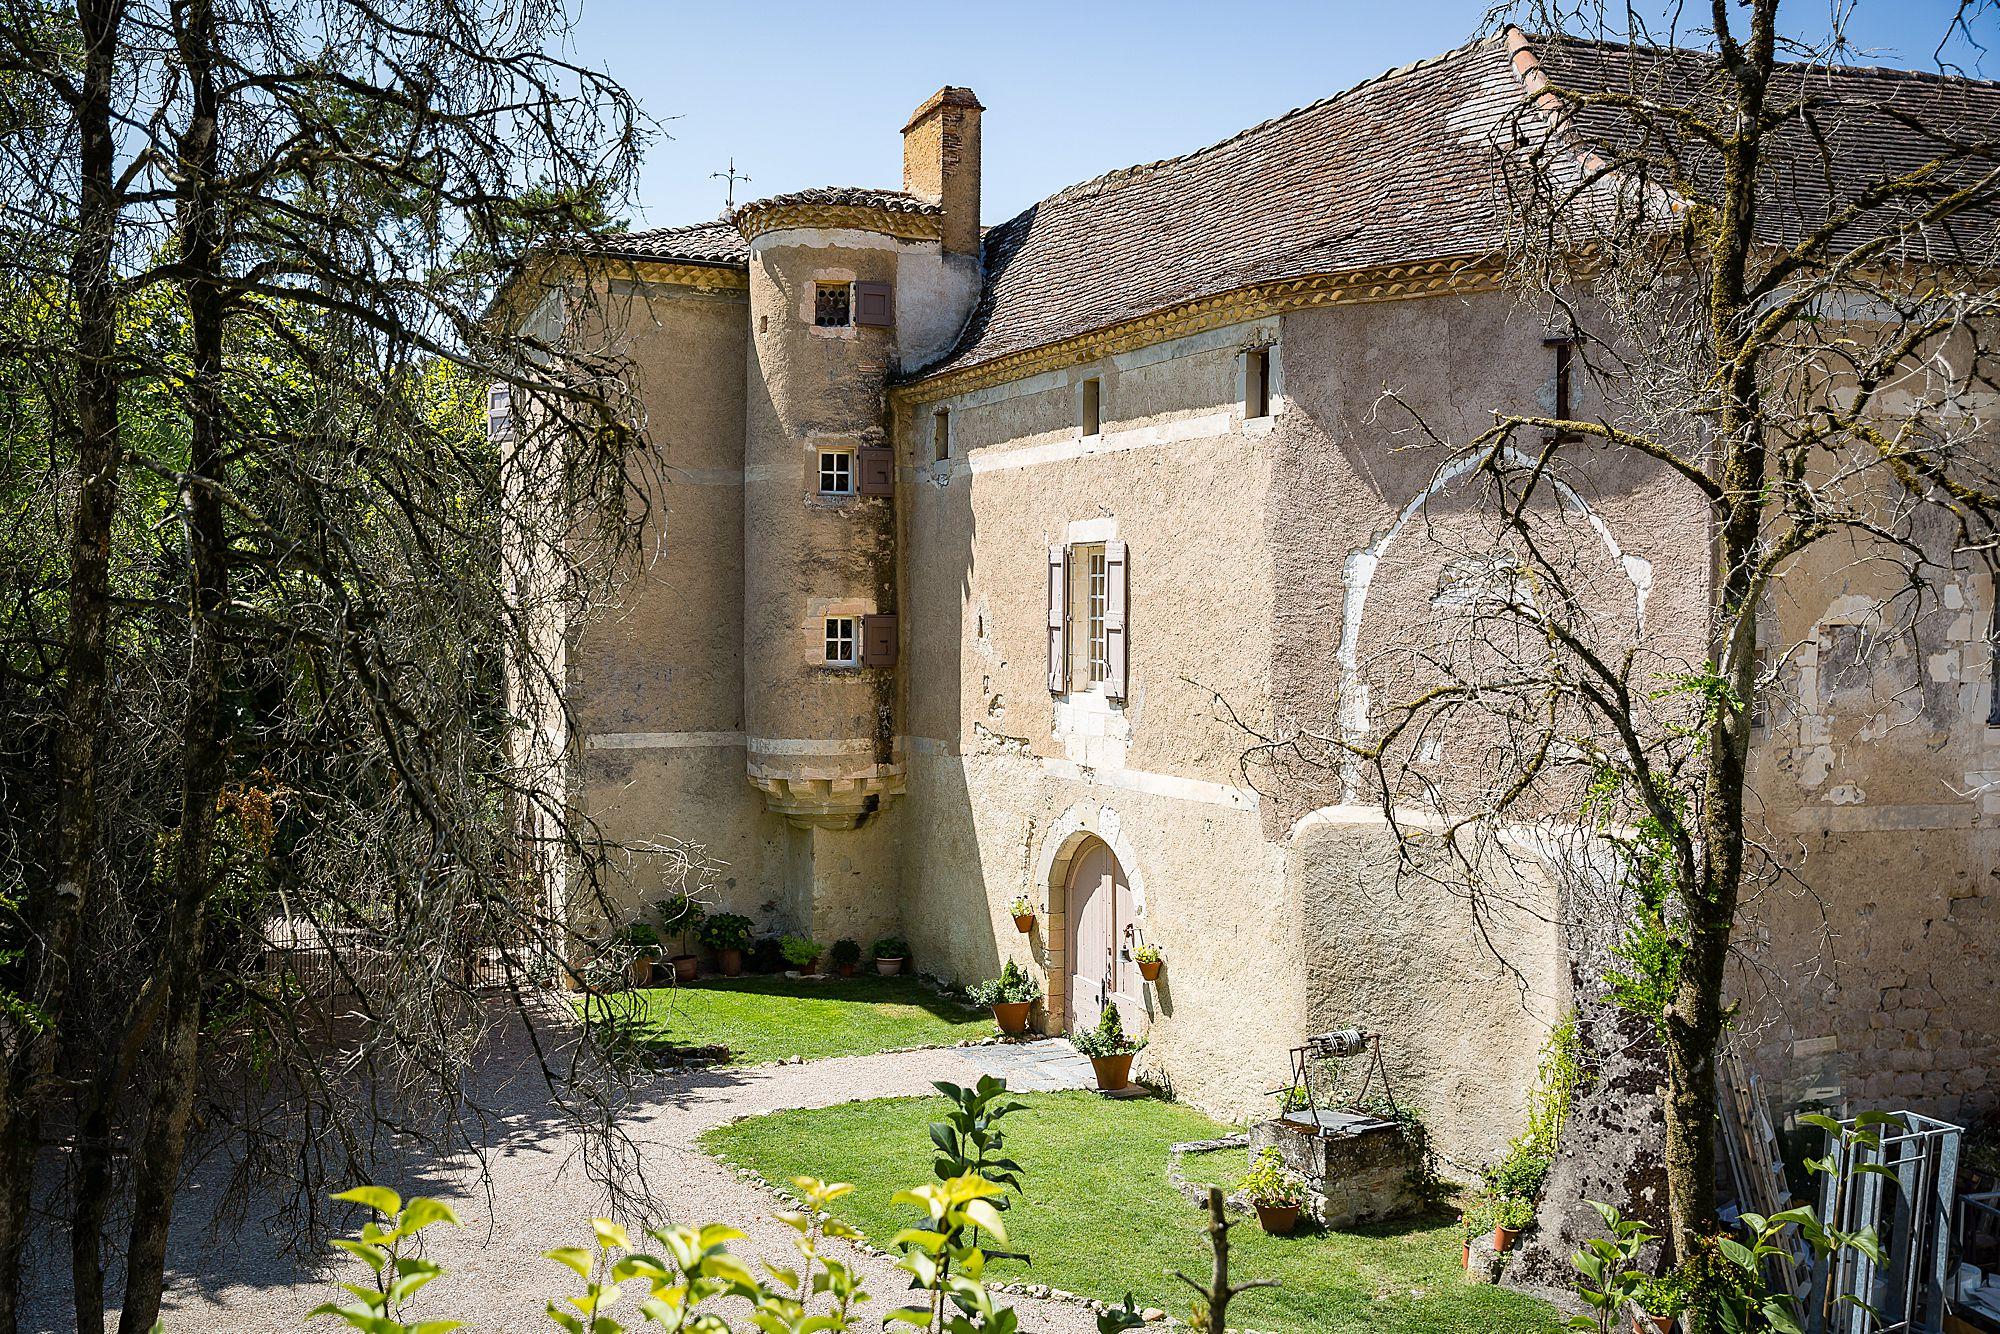 Chateau de Brametourte